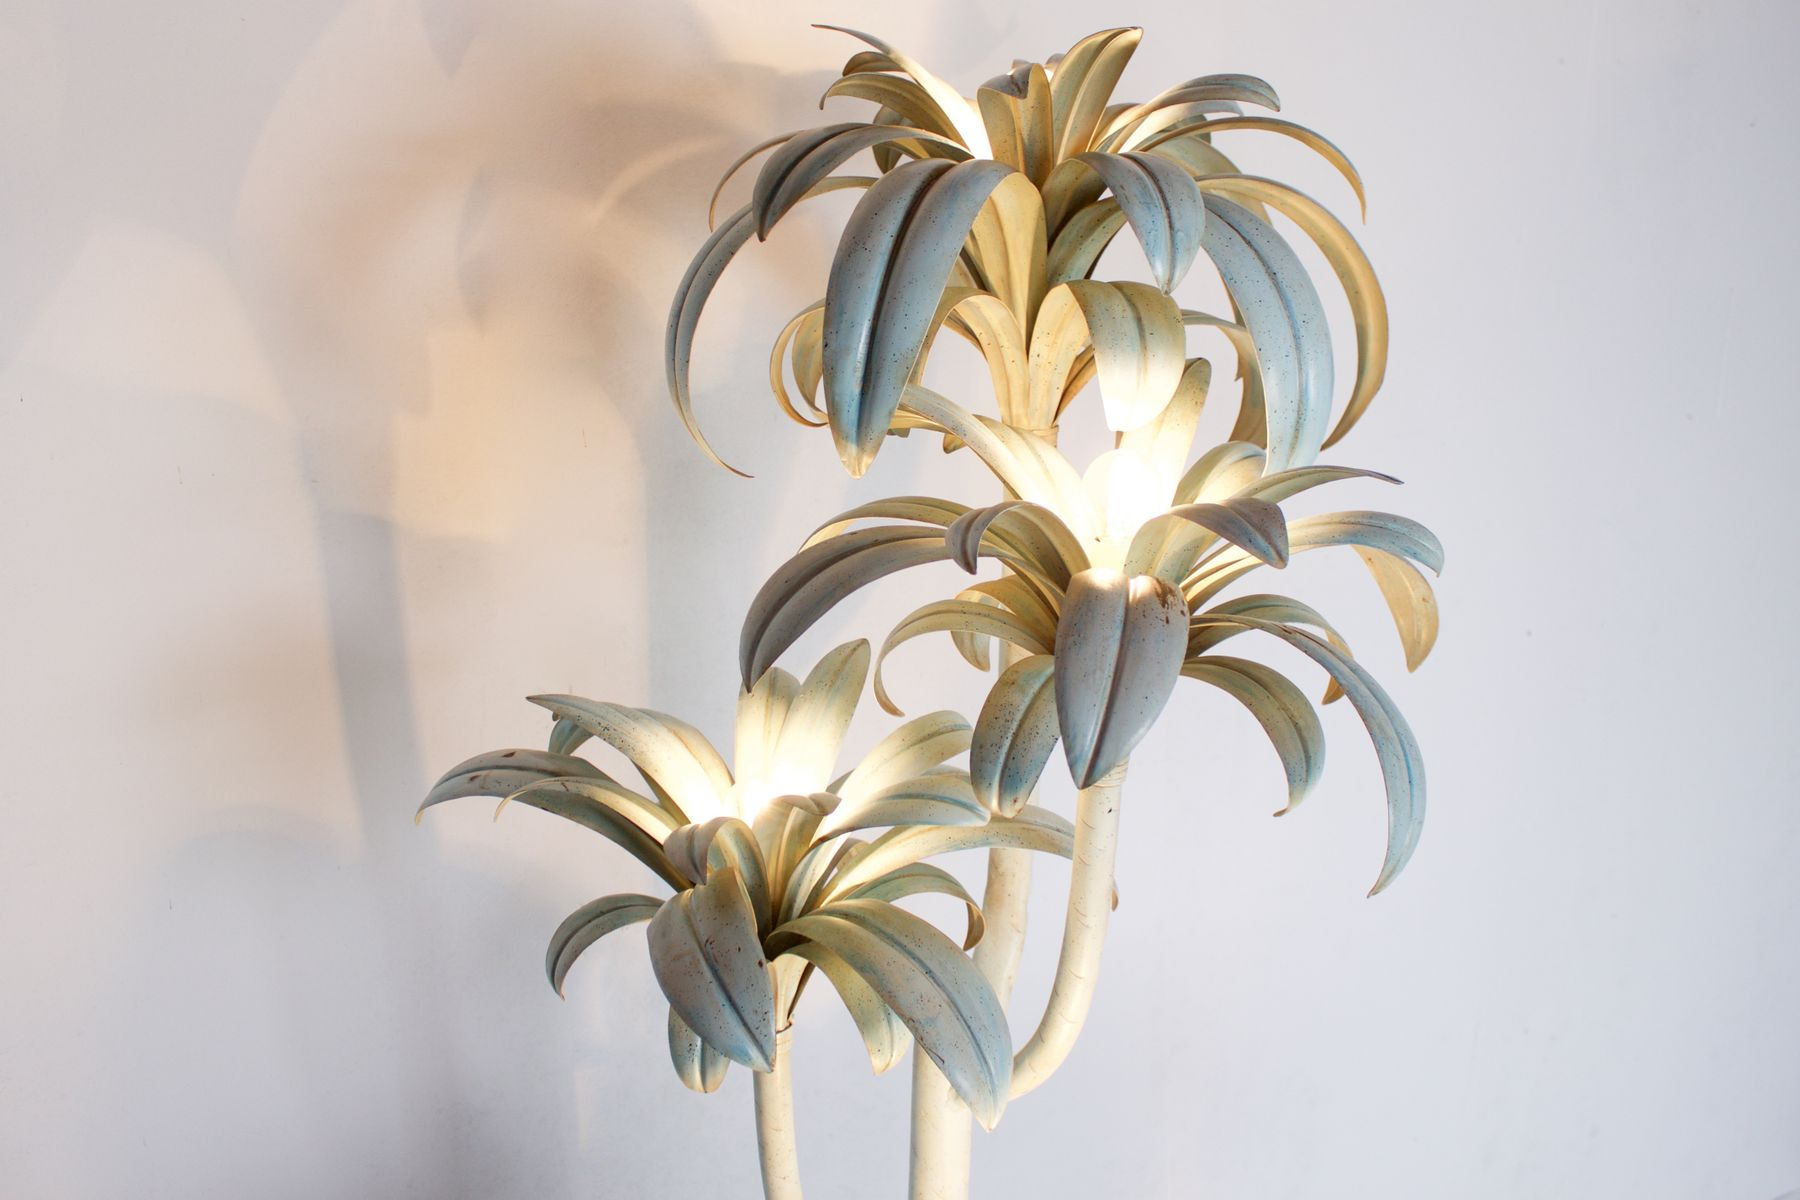 Large italian hollywood regency palm tree floor lamp 1970s for large italian hollywood regency palm tree floor lamp 1970s aloadofball Gallery